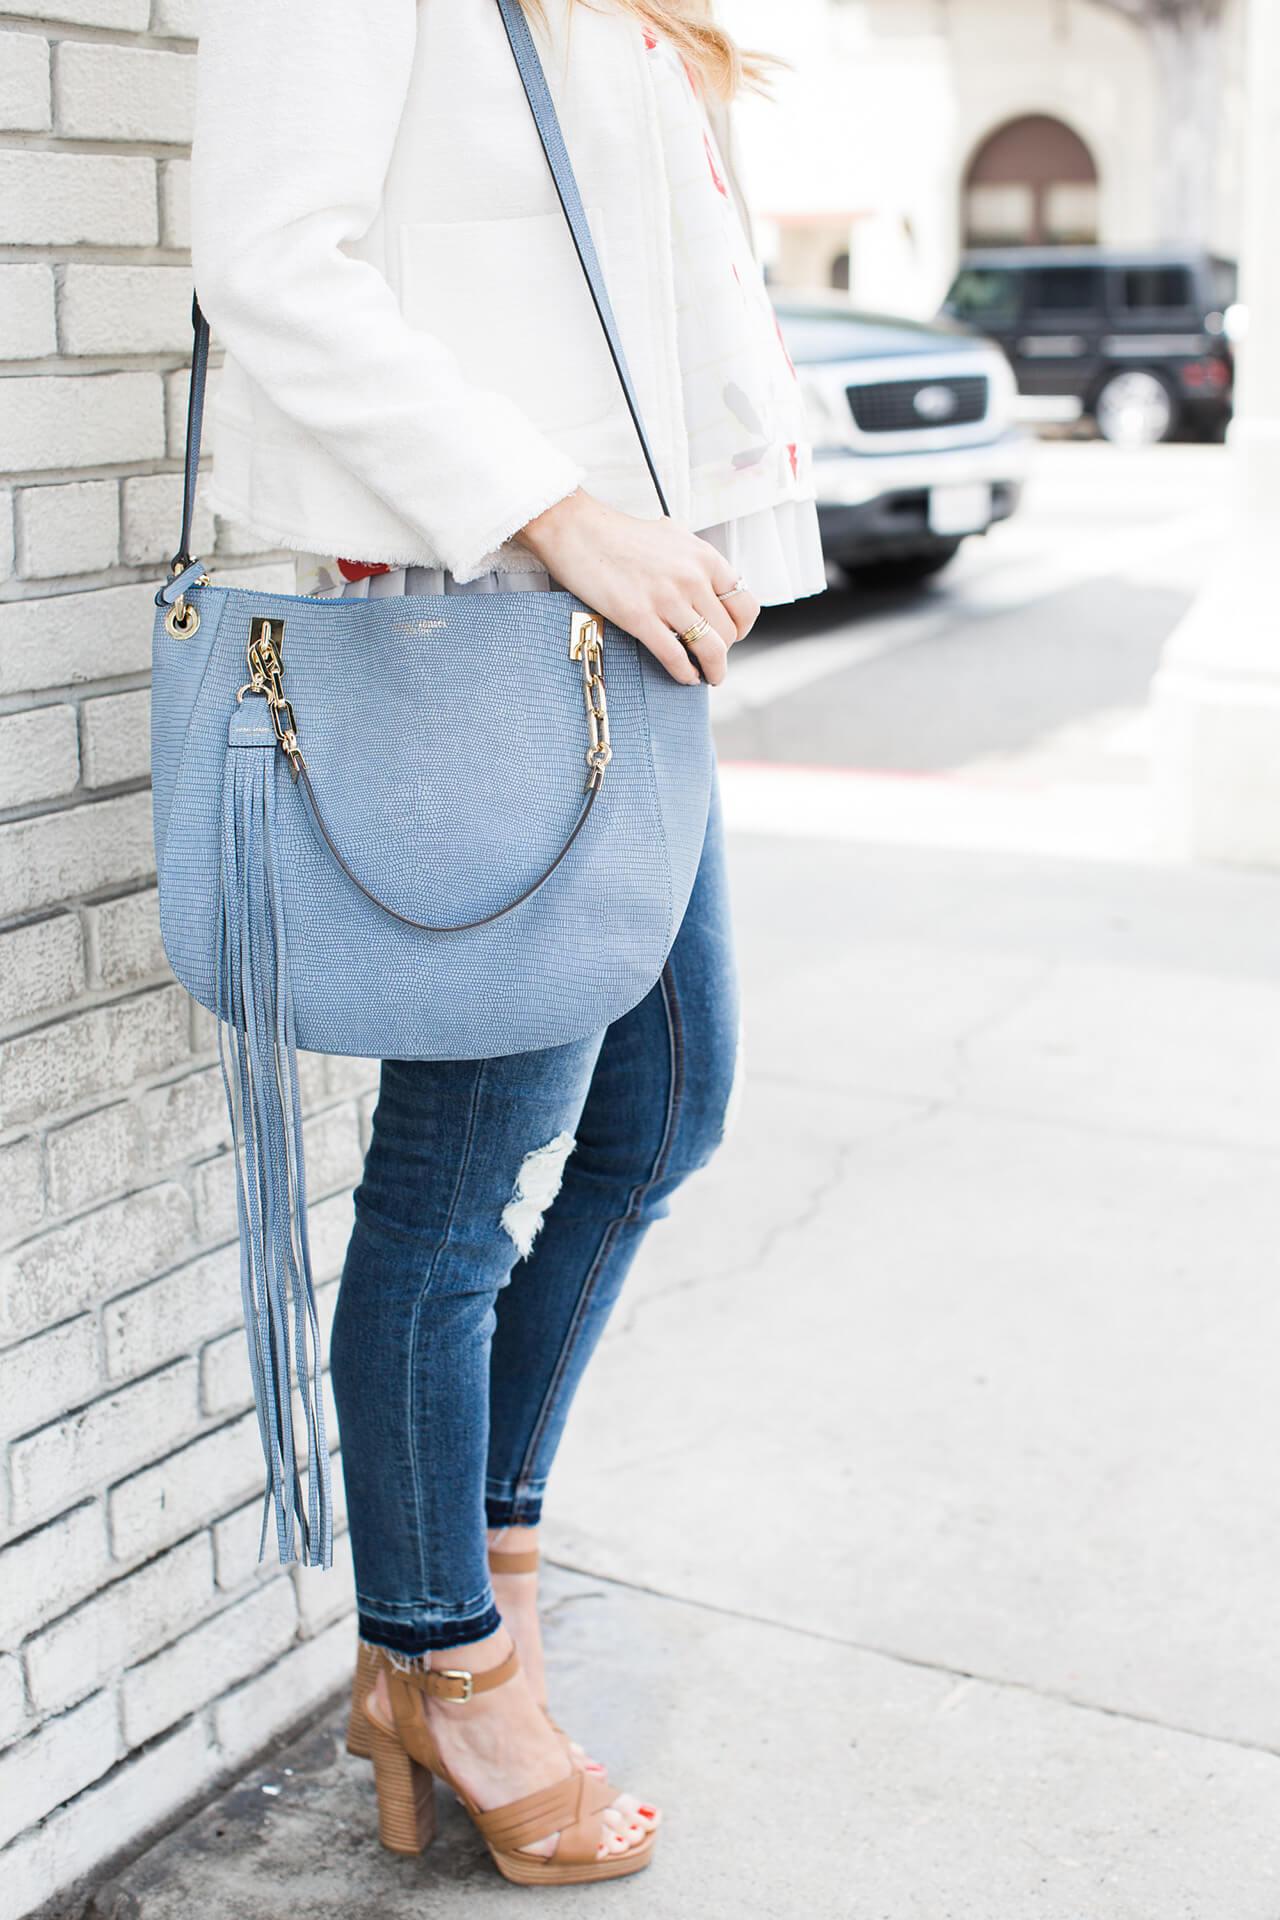 blue satchel bag with fringe and skinny jeans with sandal heels